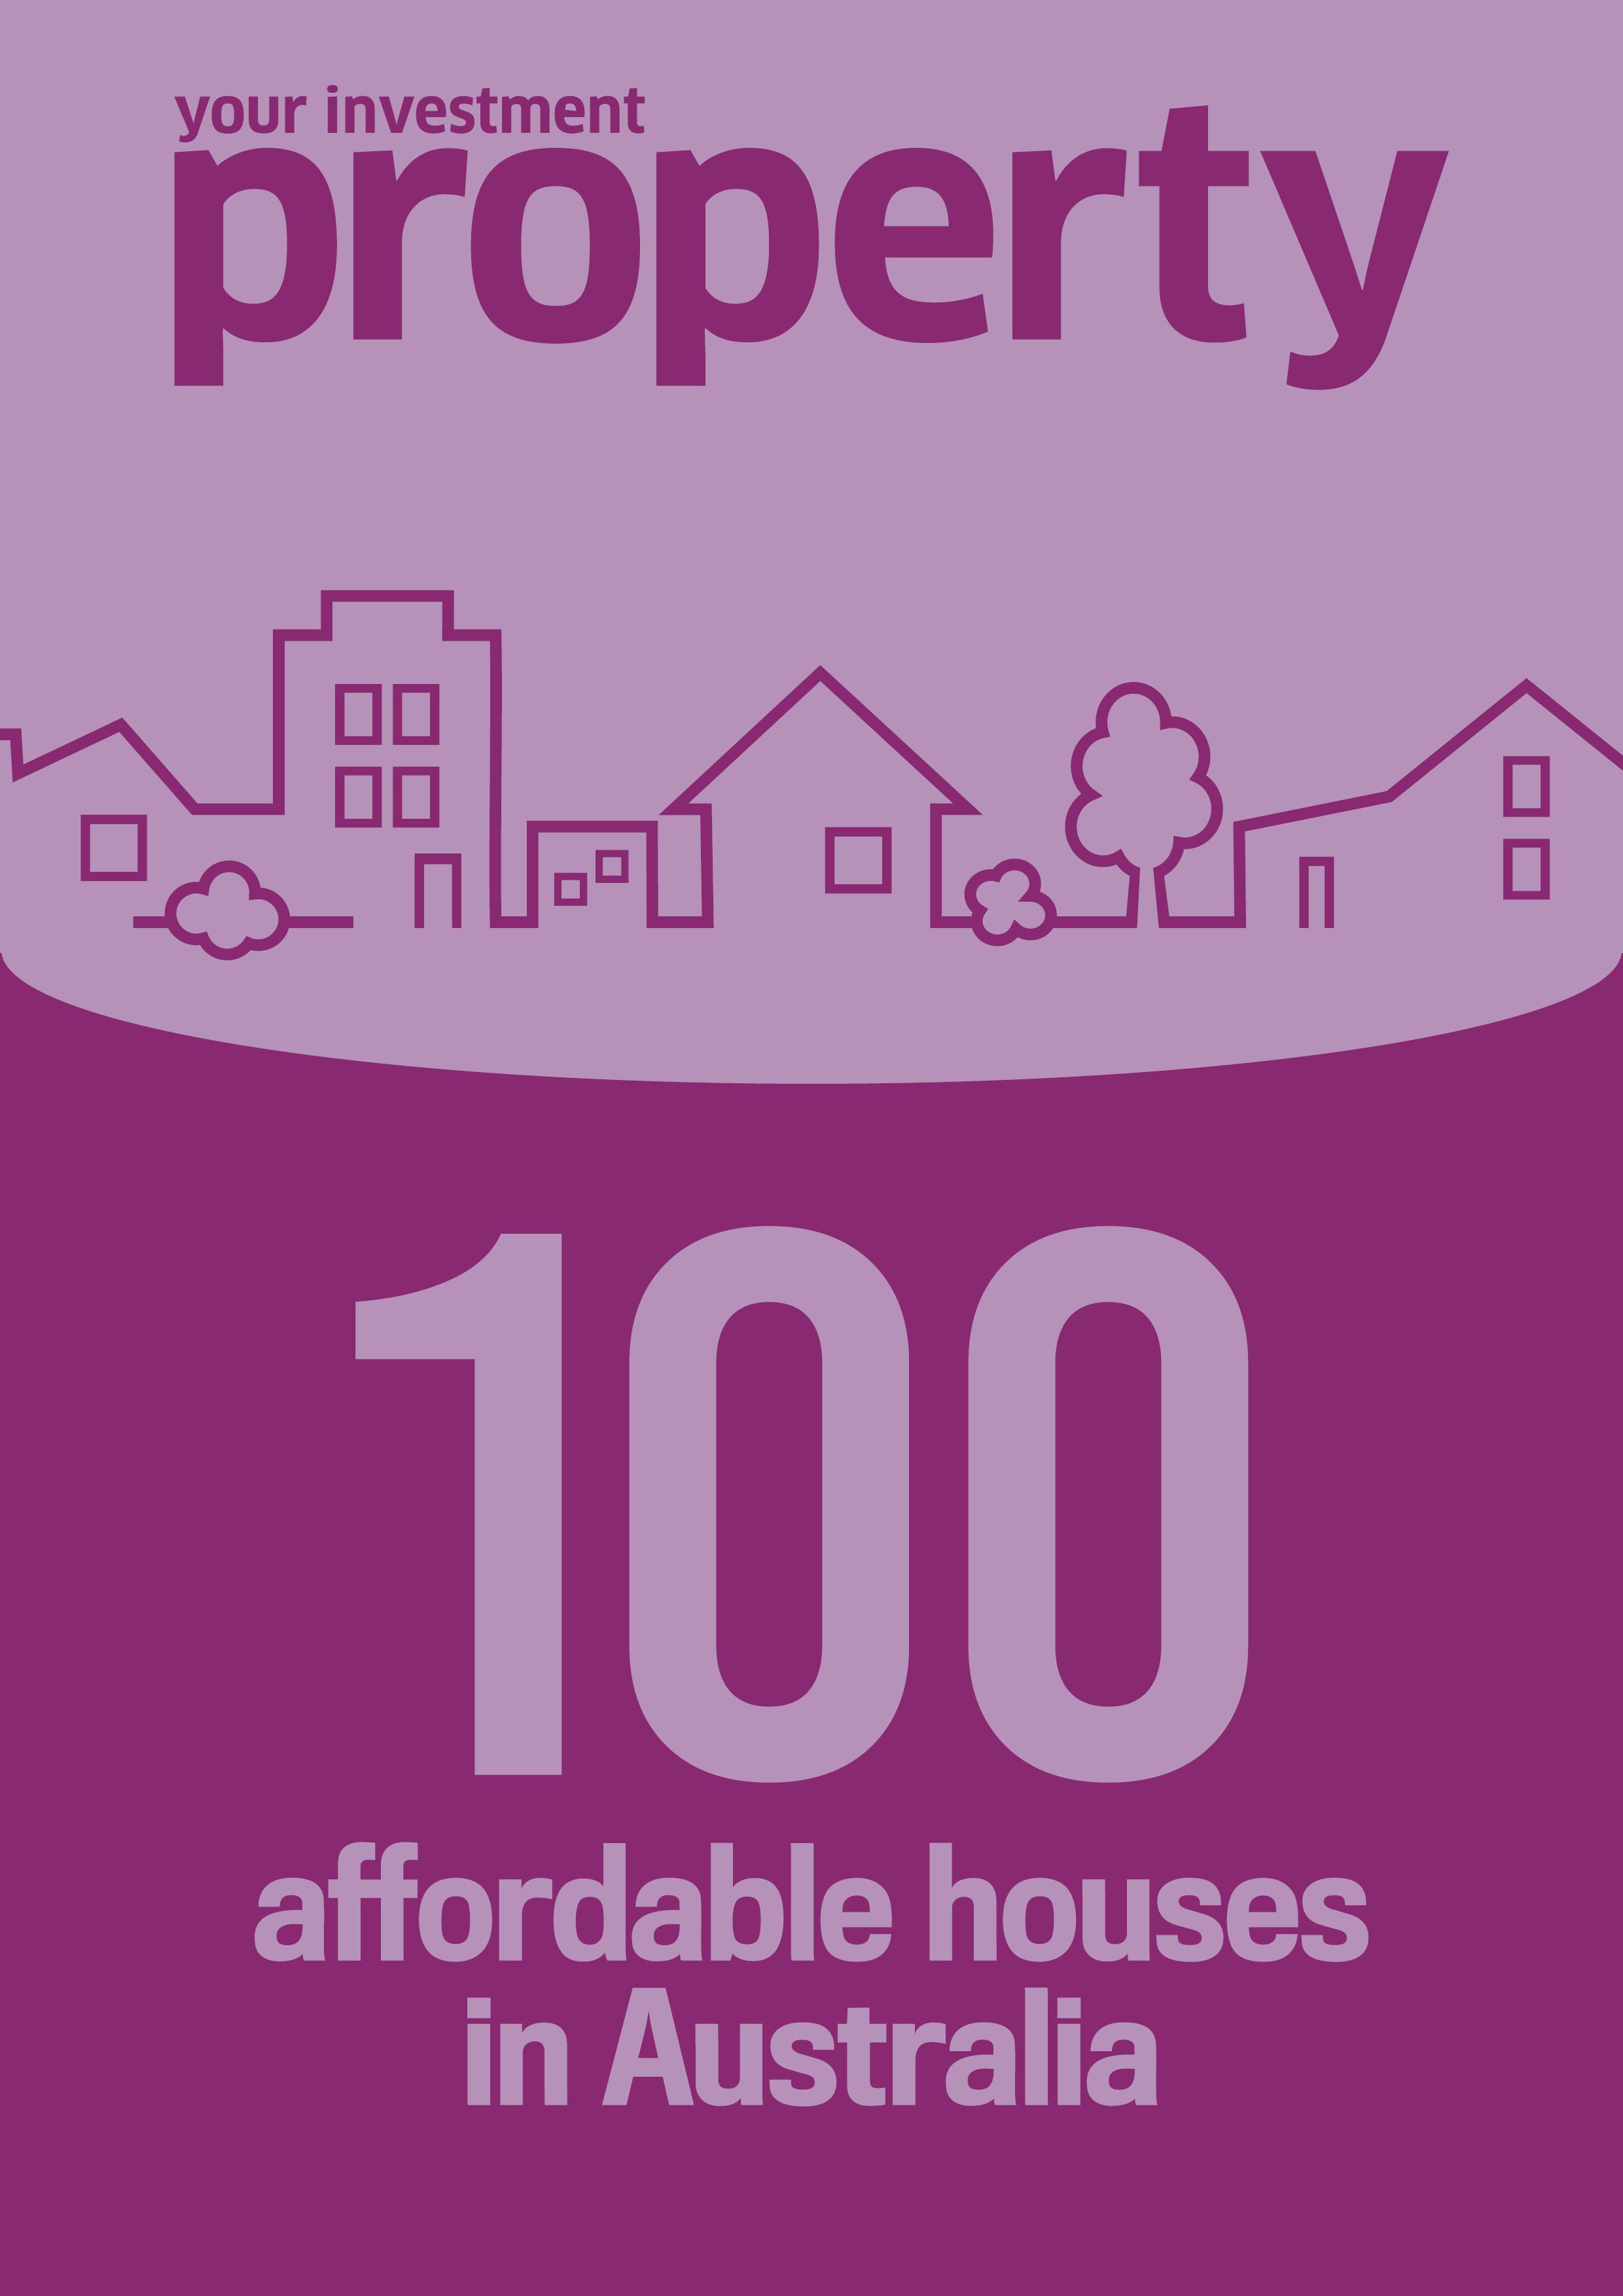 YIP 100 affordable houses near capital cities